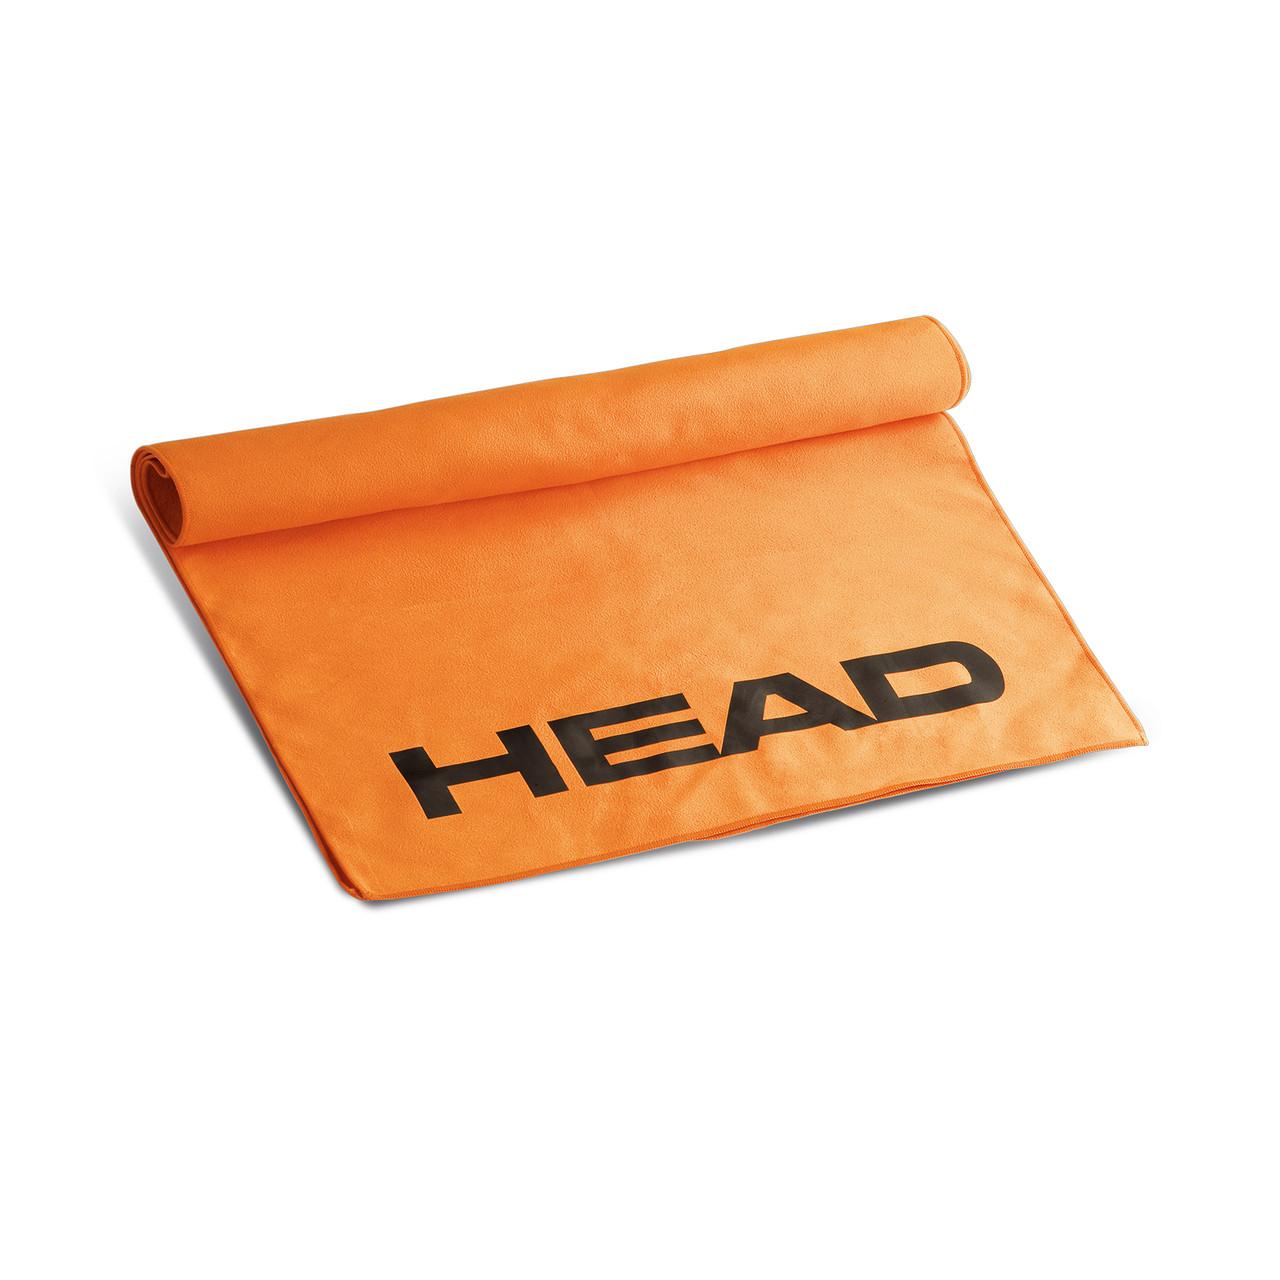 Полотенце HEAD из микрофибры размер:80*40cm